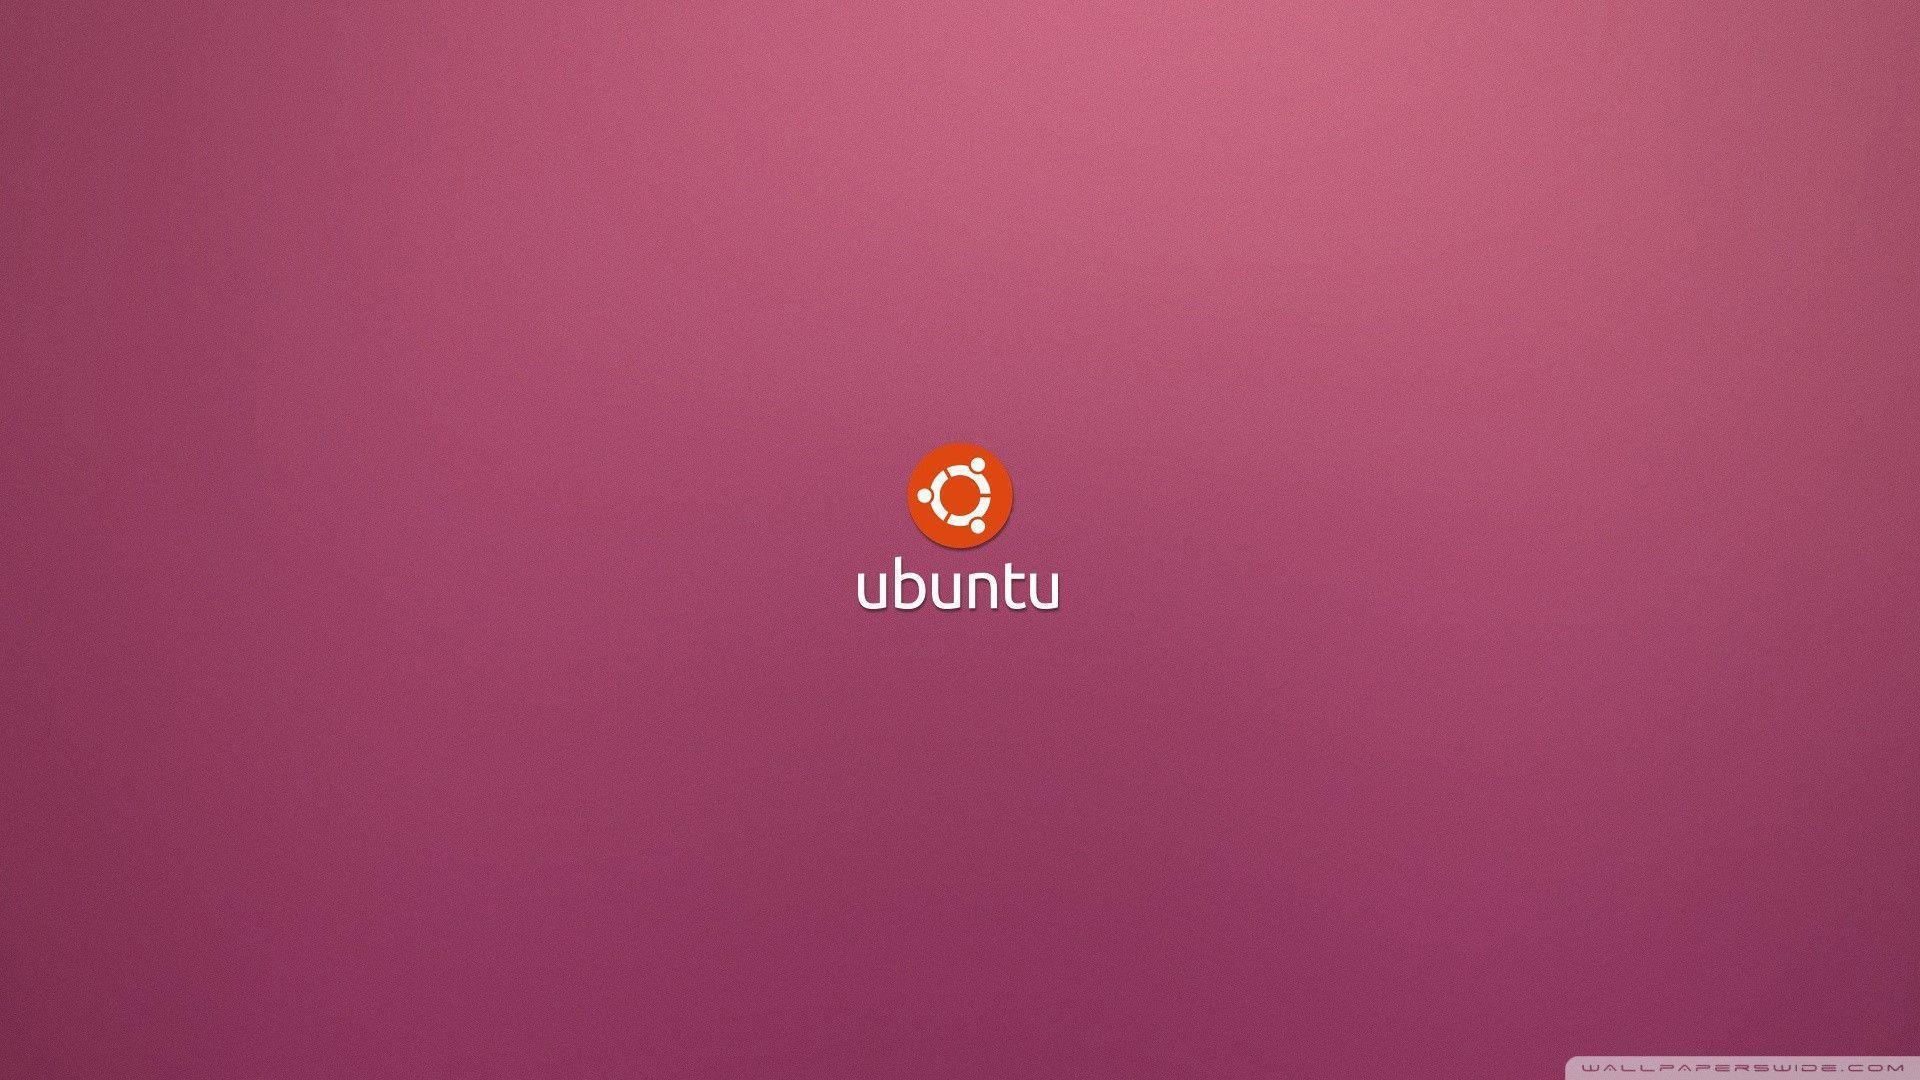 Ubuntu Desktop Backgrounds 1920x1080